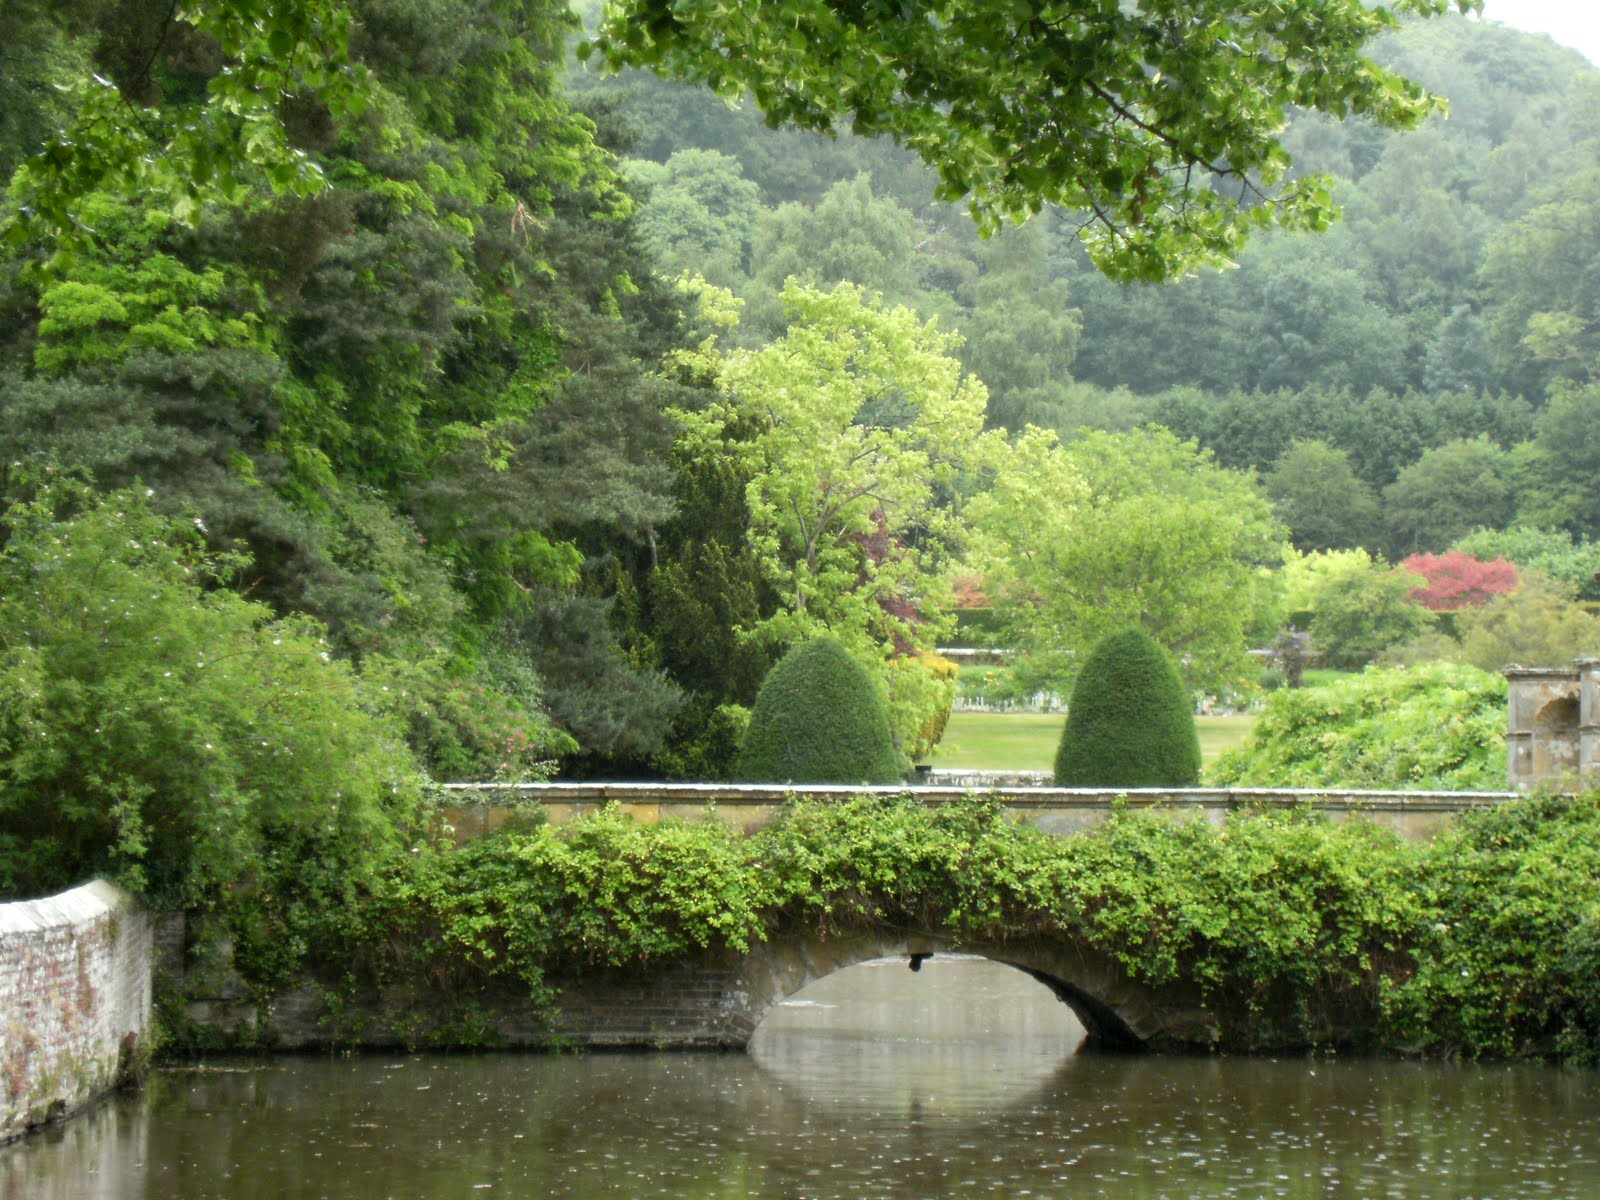 DSCF8231 Groombridge Place moat and gardens